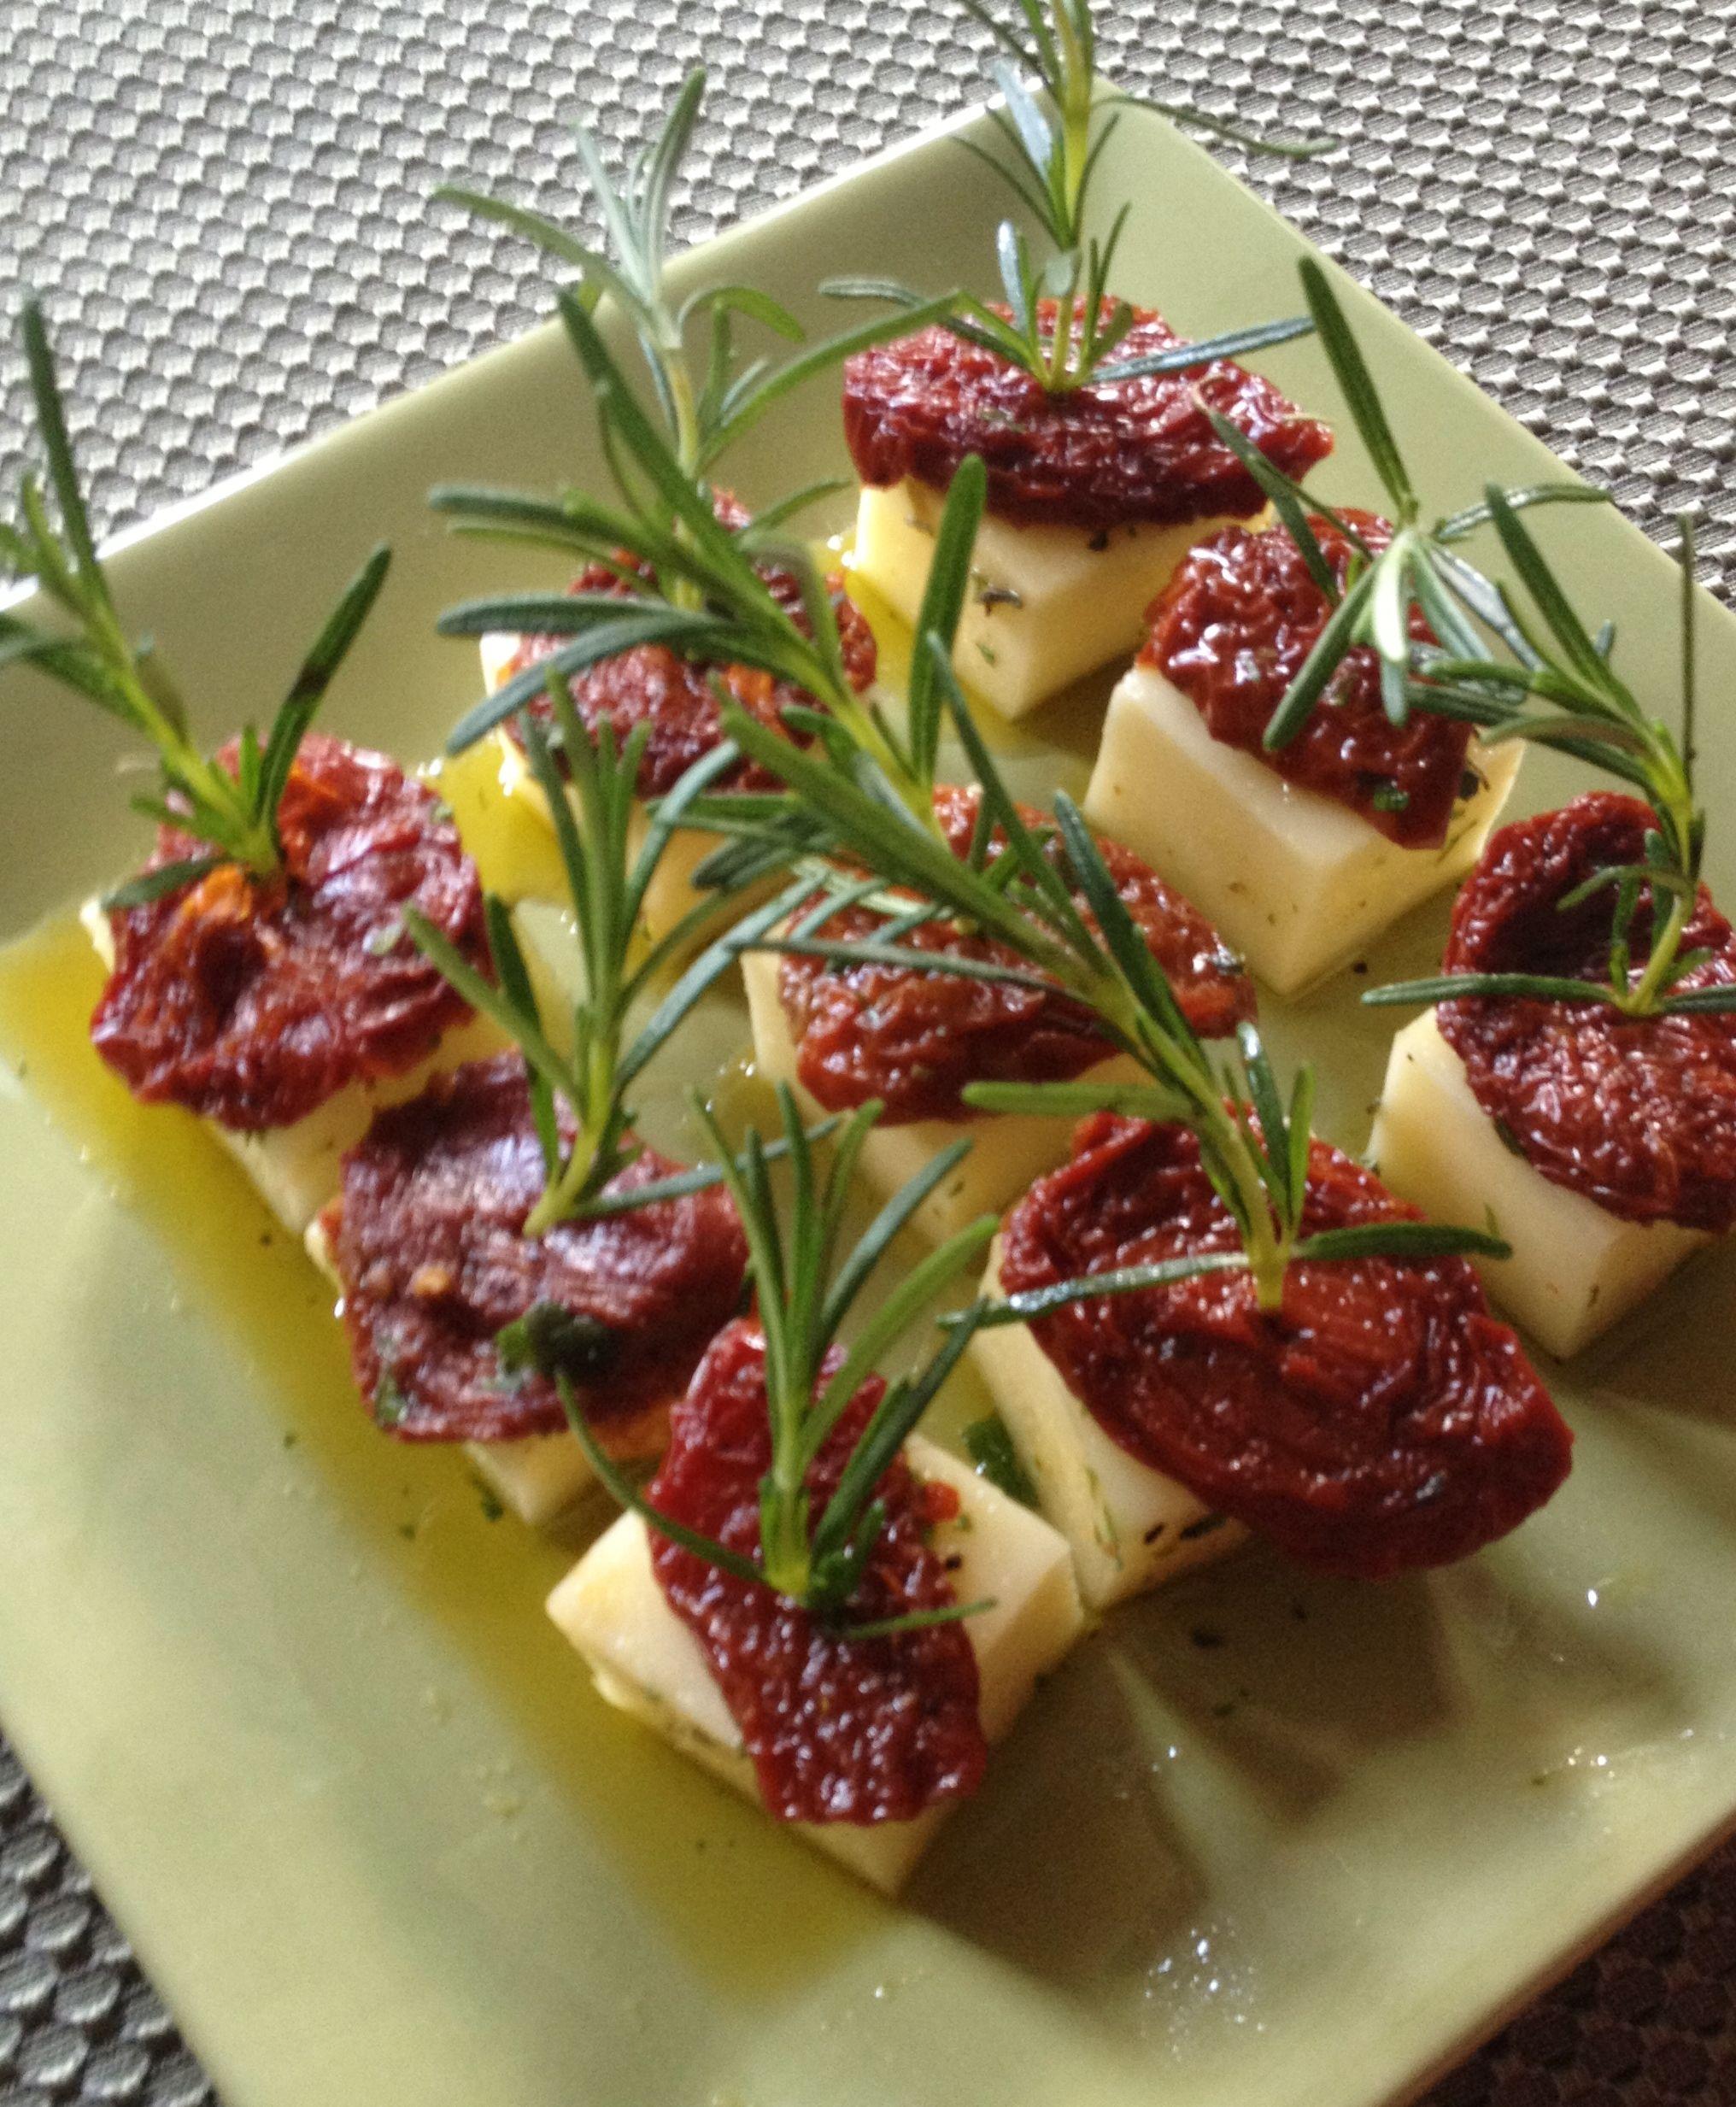 Marinated Mozzarella, Sun Dried Tomato, And Rosemary Appetizers  Jee